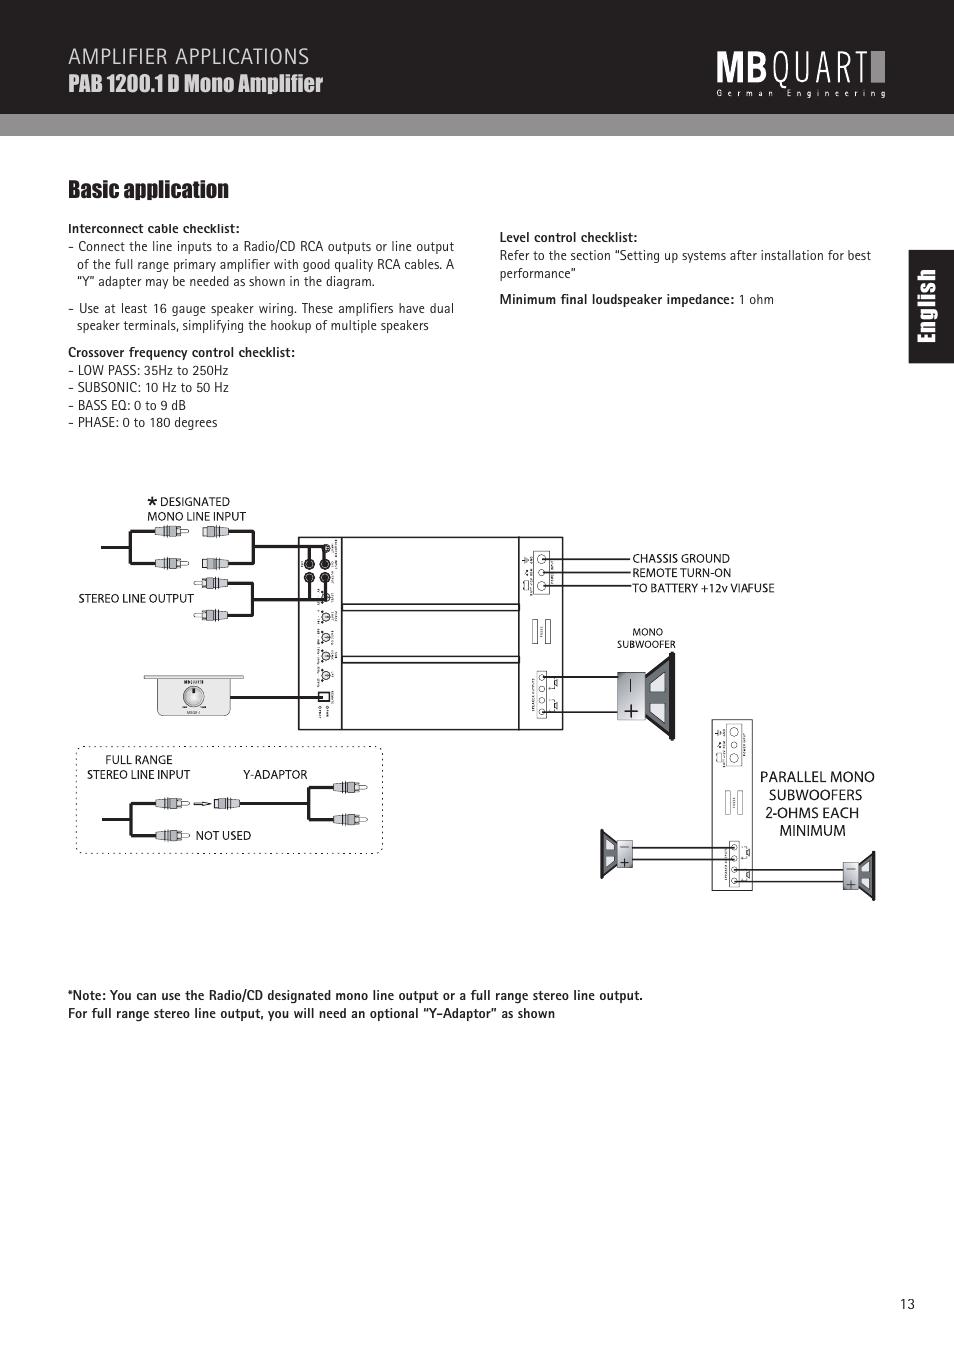 hight resolution of mb quart wiring diagram wiring diagram third level alpine car audio wiring diagram mb quart wire